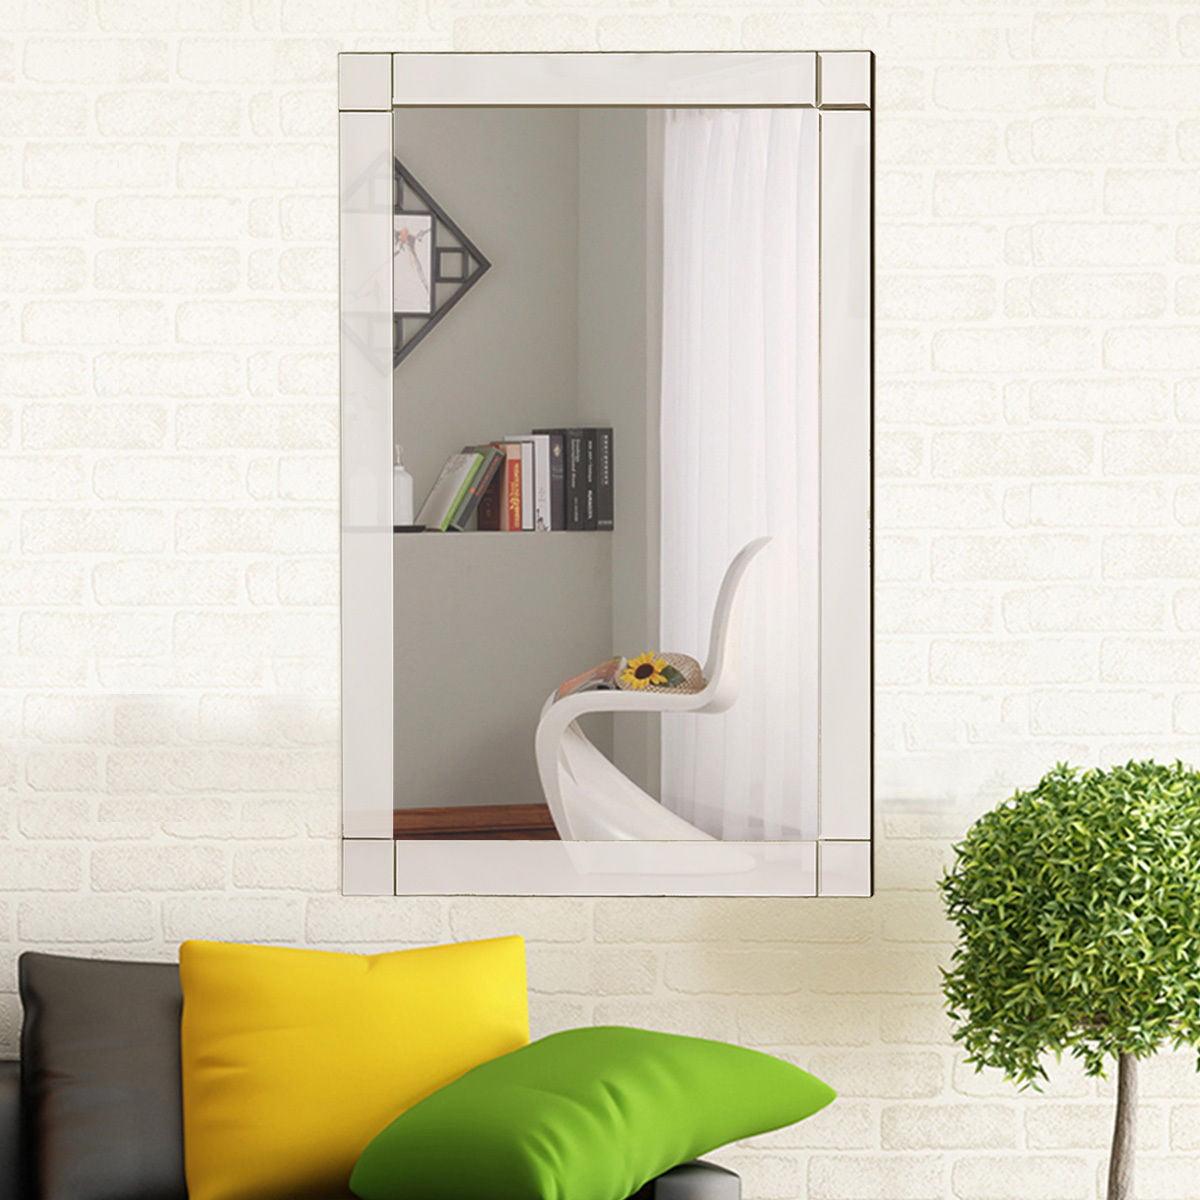 36'' Wall Mirror Rectangle Vanity Makeup Mirror Decor MDF Frame Bathroom Home - image 8 of 8